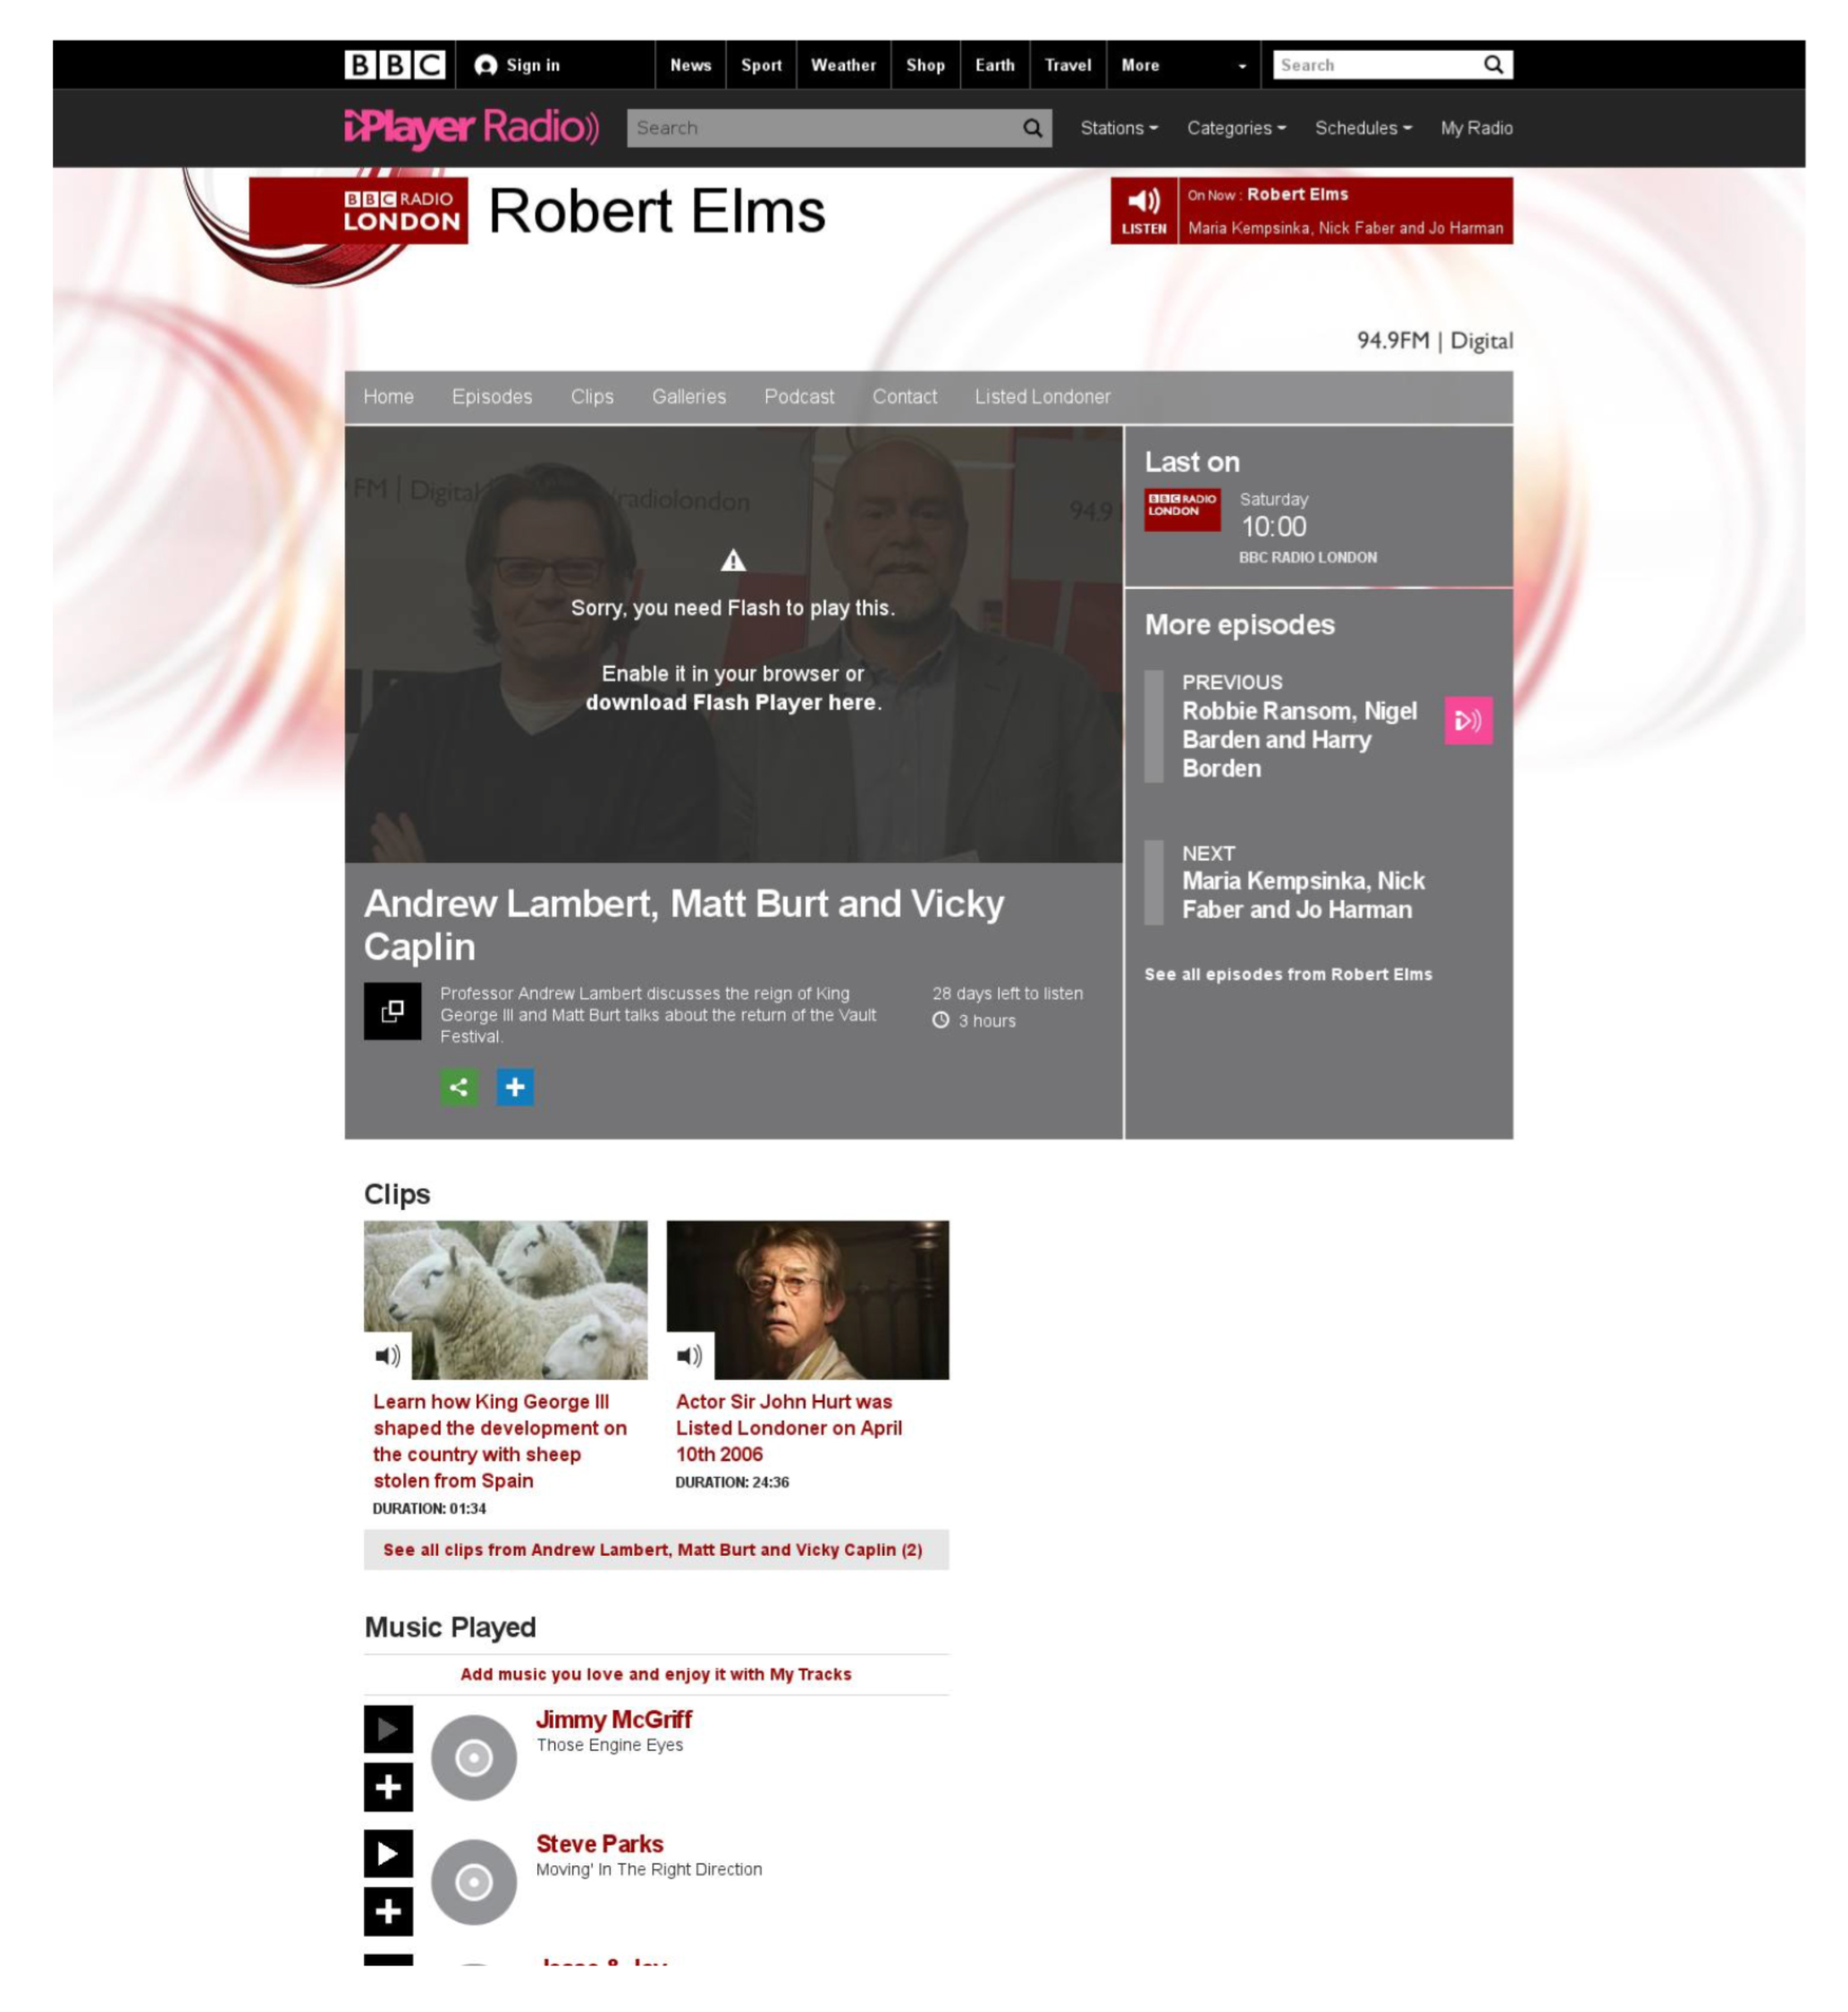 BB Robert Elms Radio Show Press